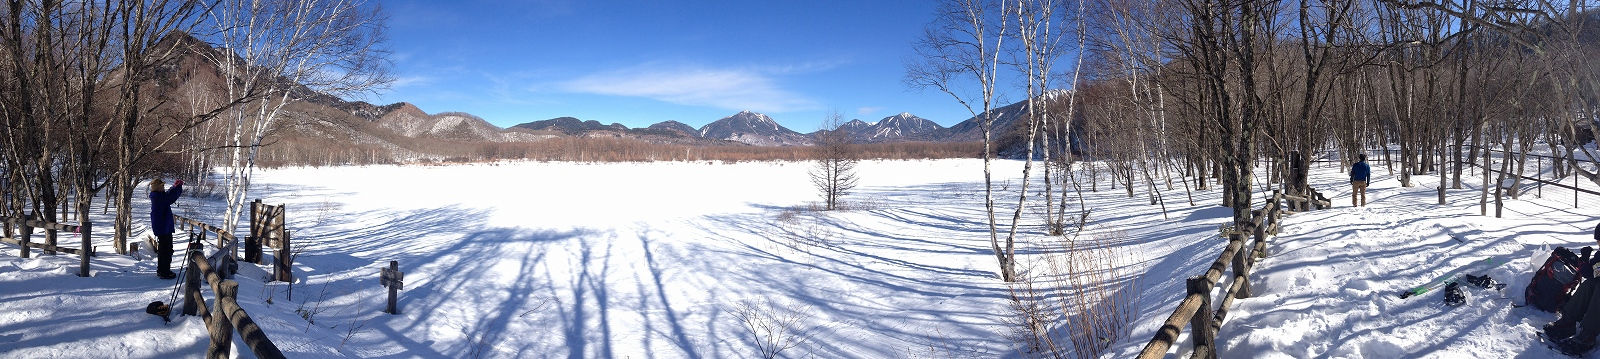 snowshoe09.jpg